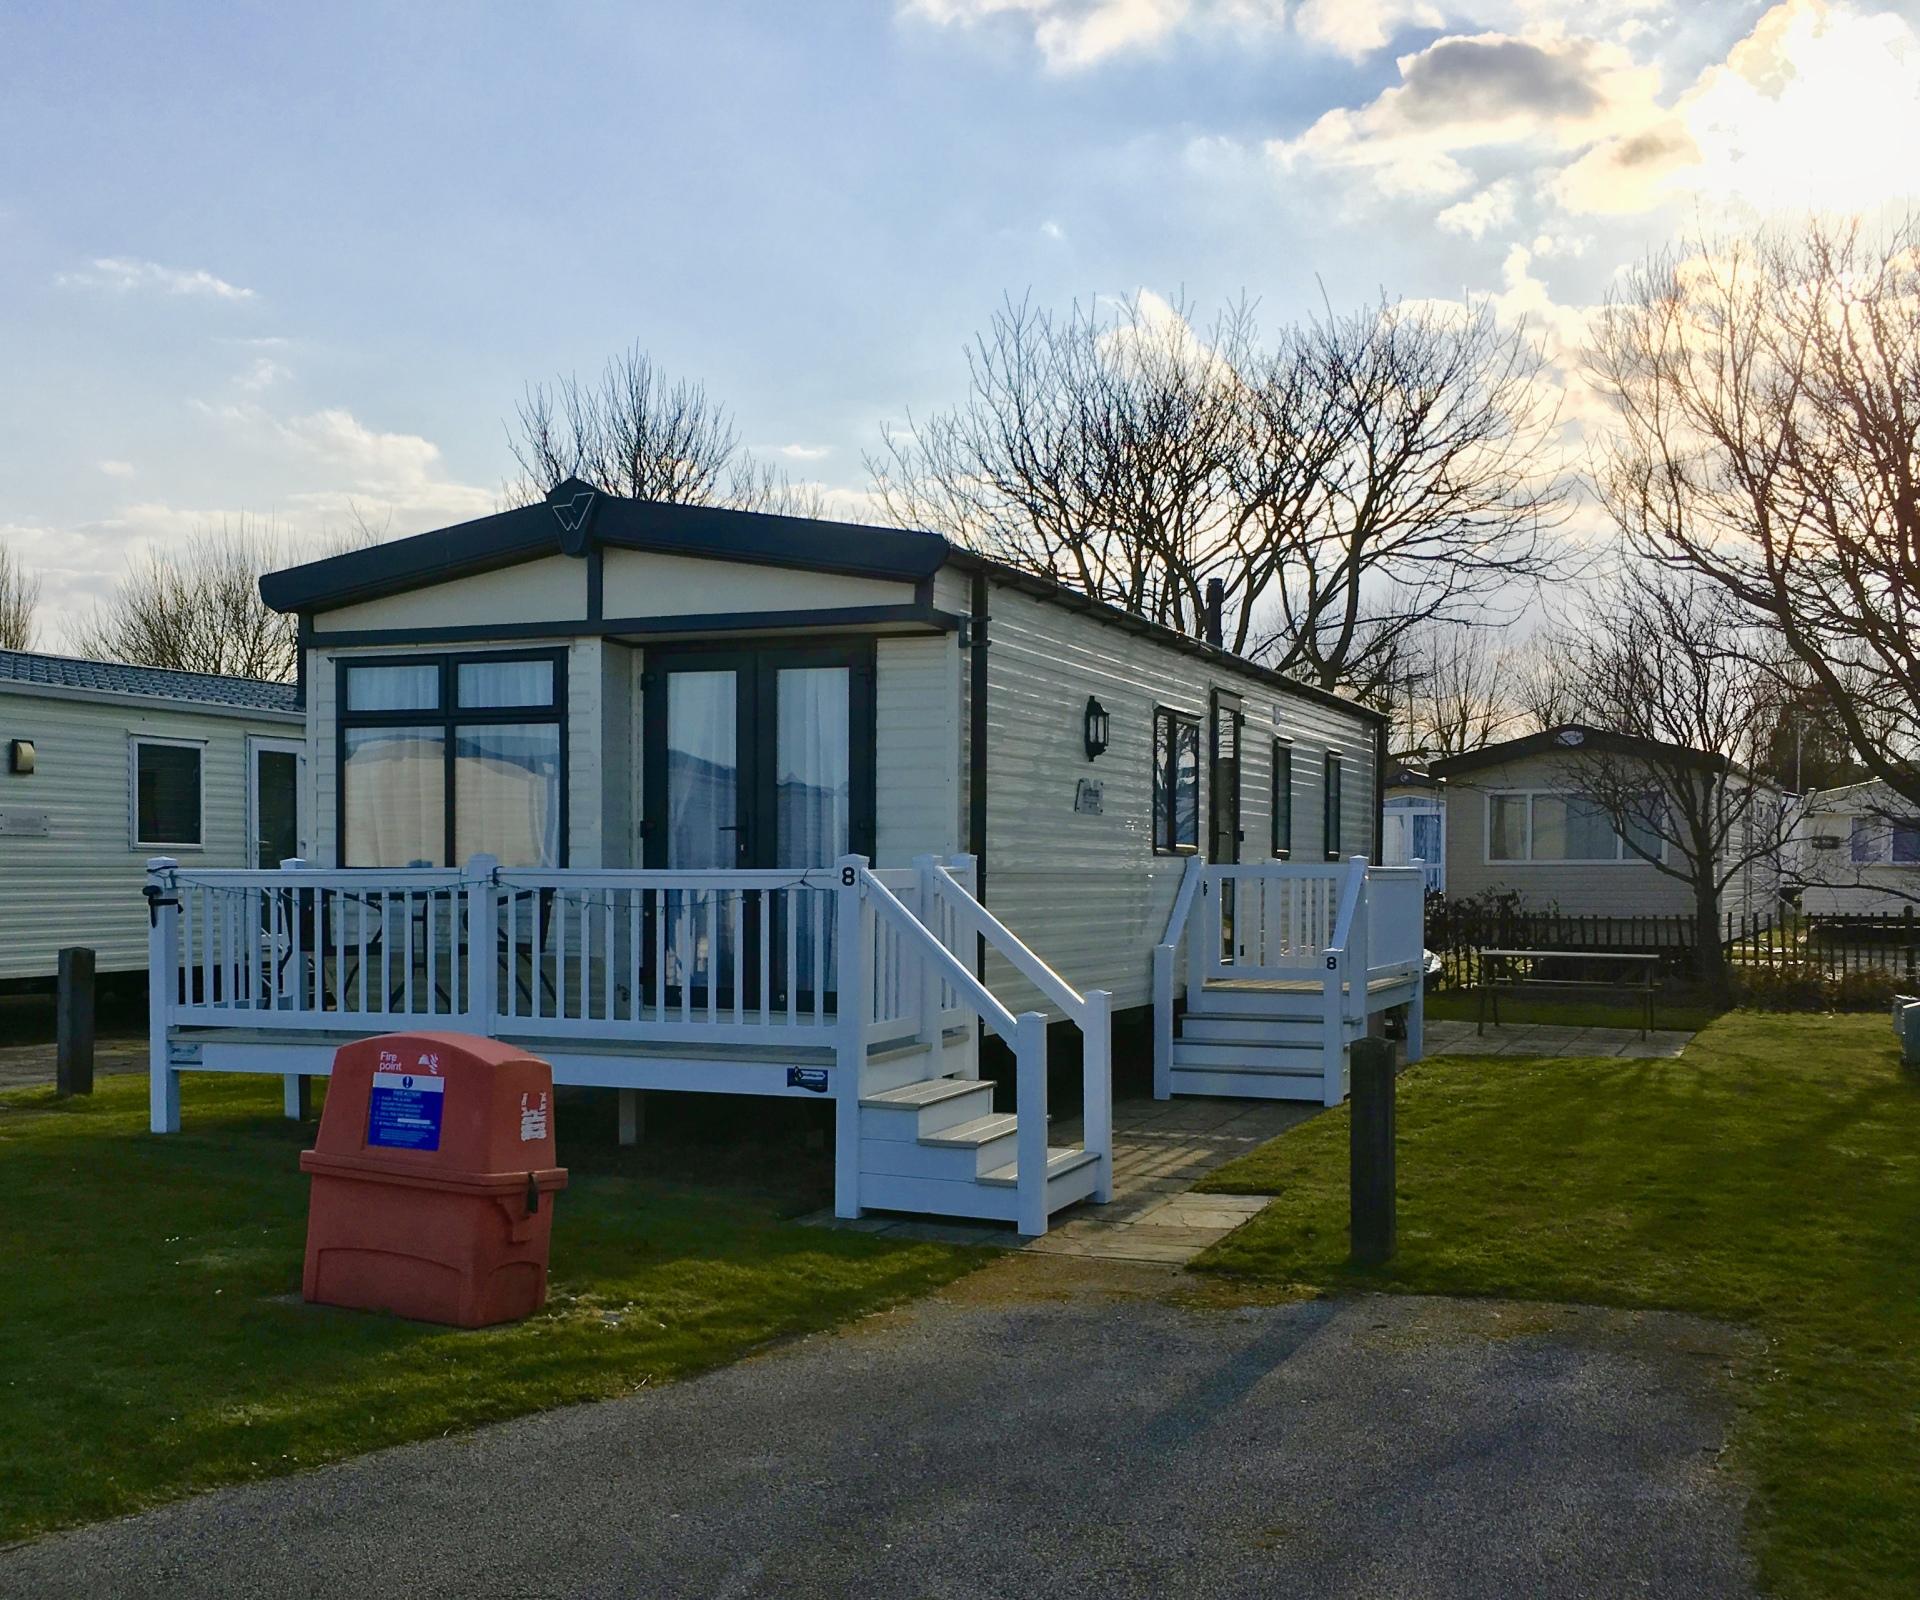 Shorefield 8 - Waters' Retreats @Hopton